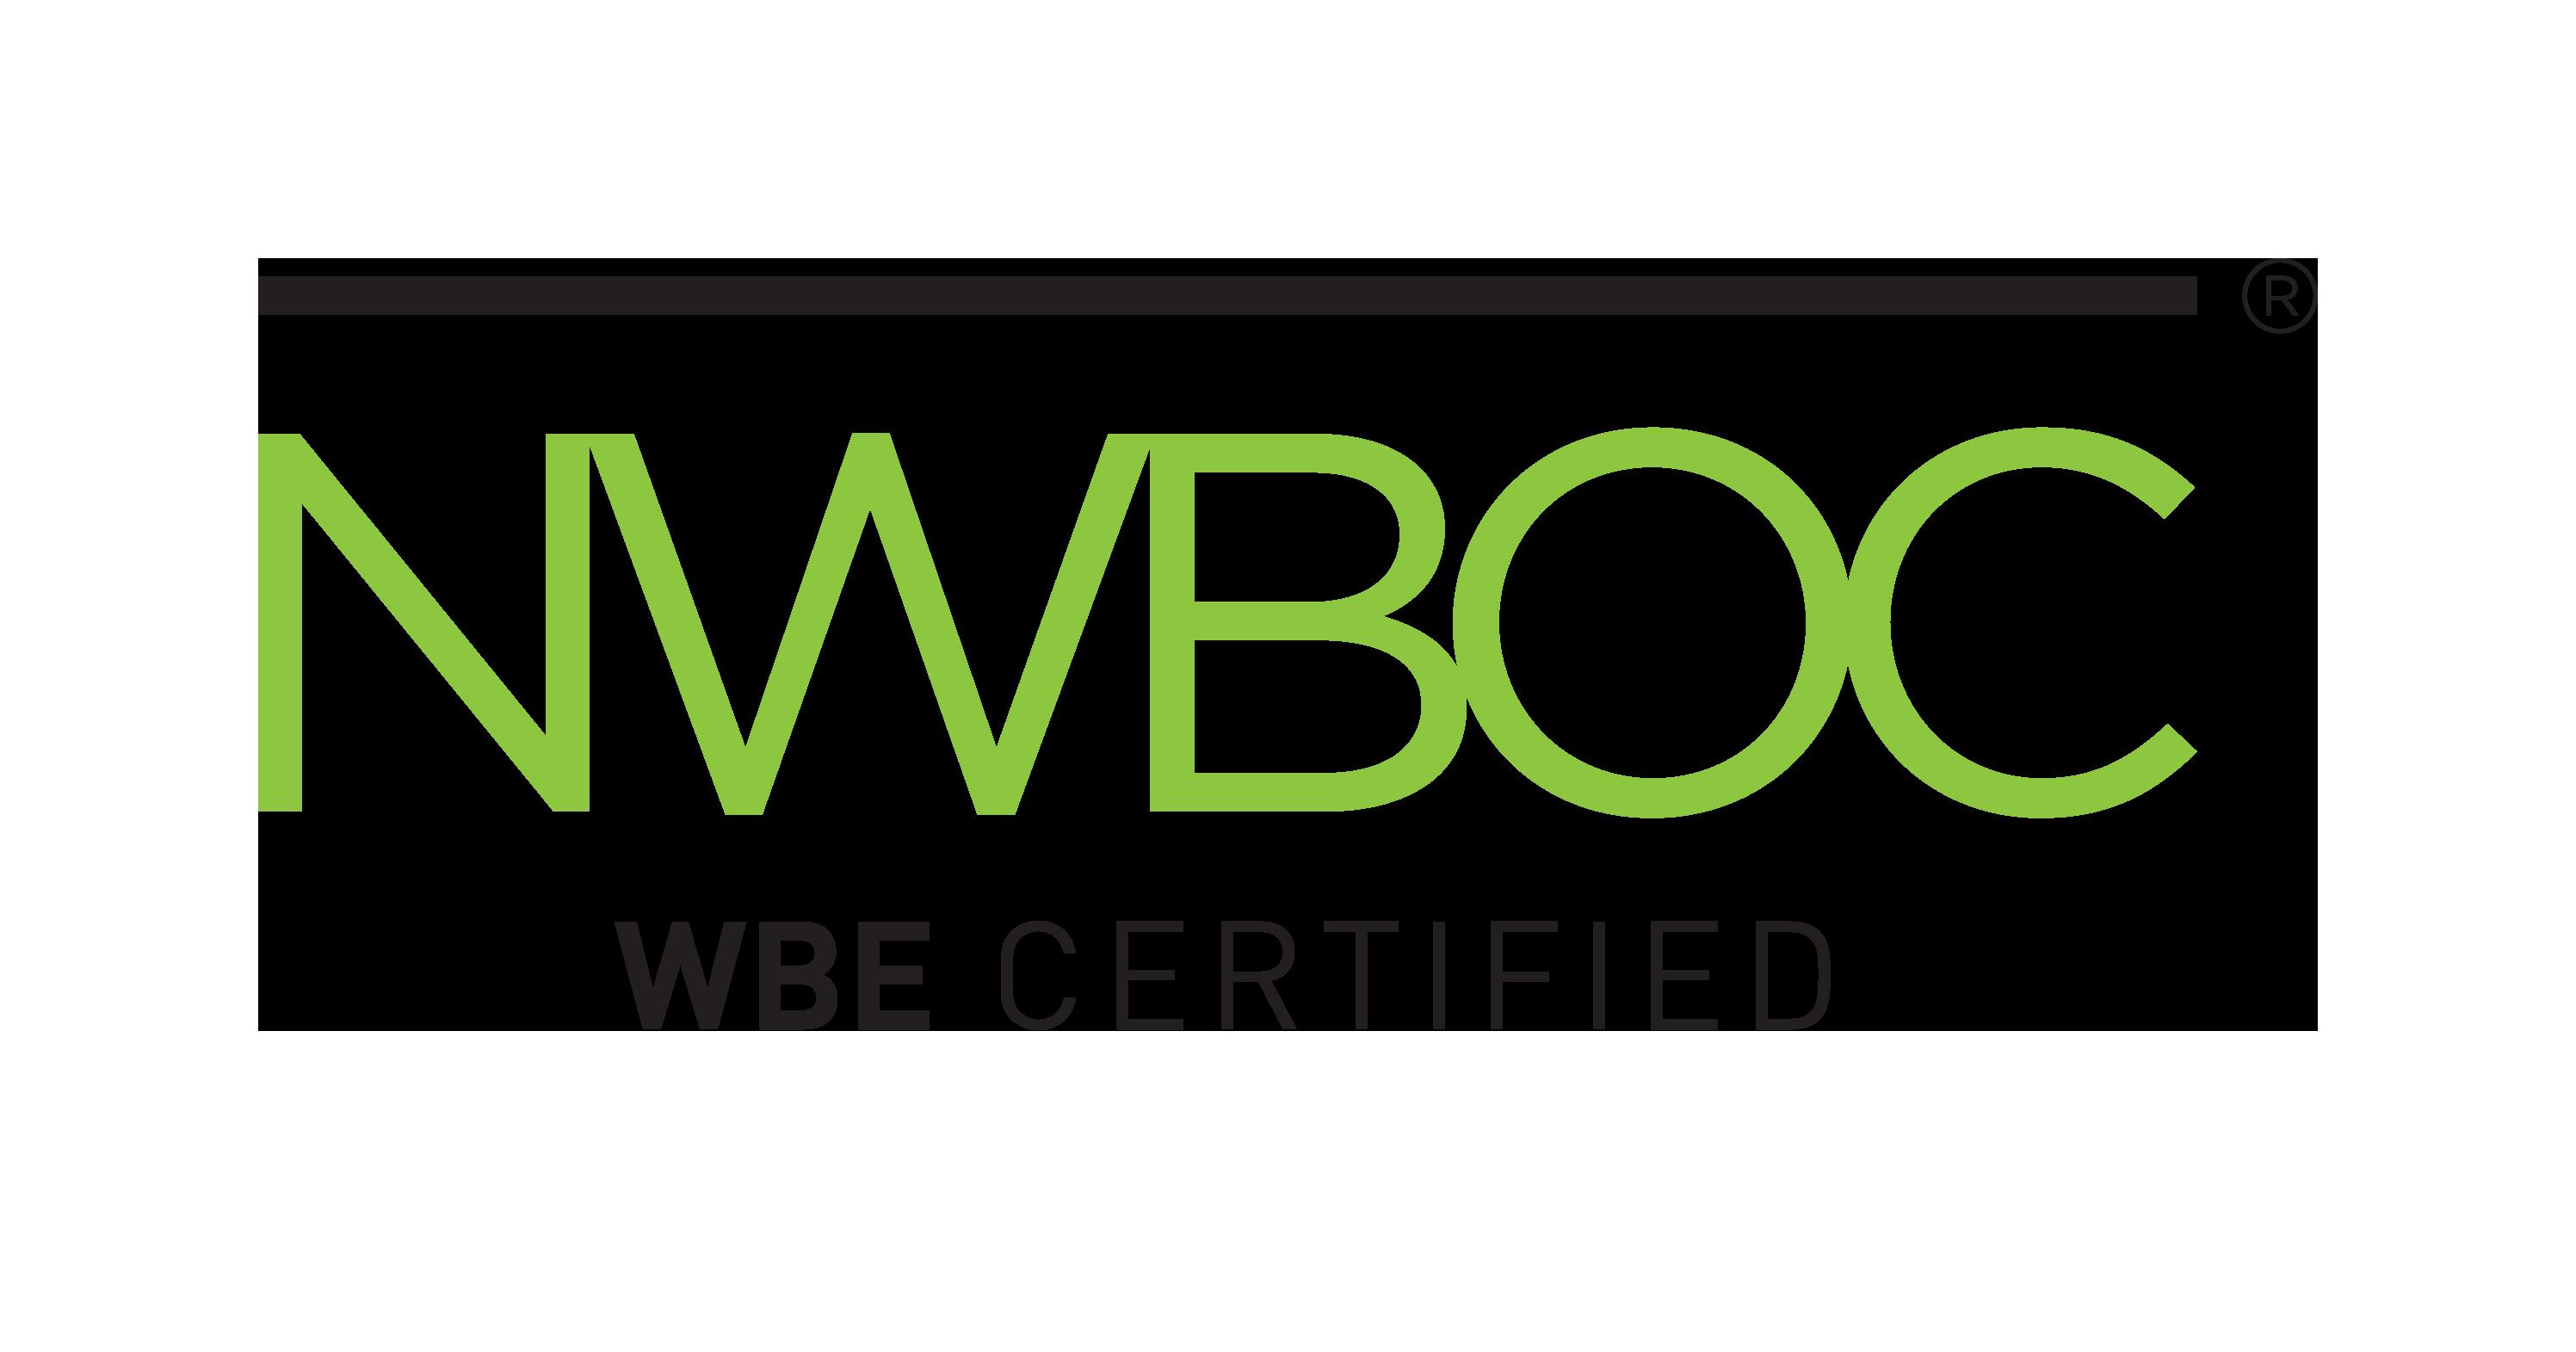 NWBOC WBE Certified logo